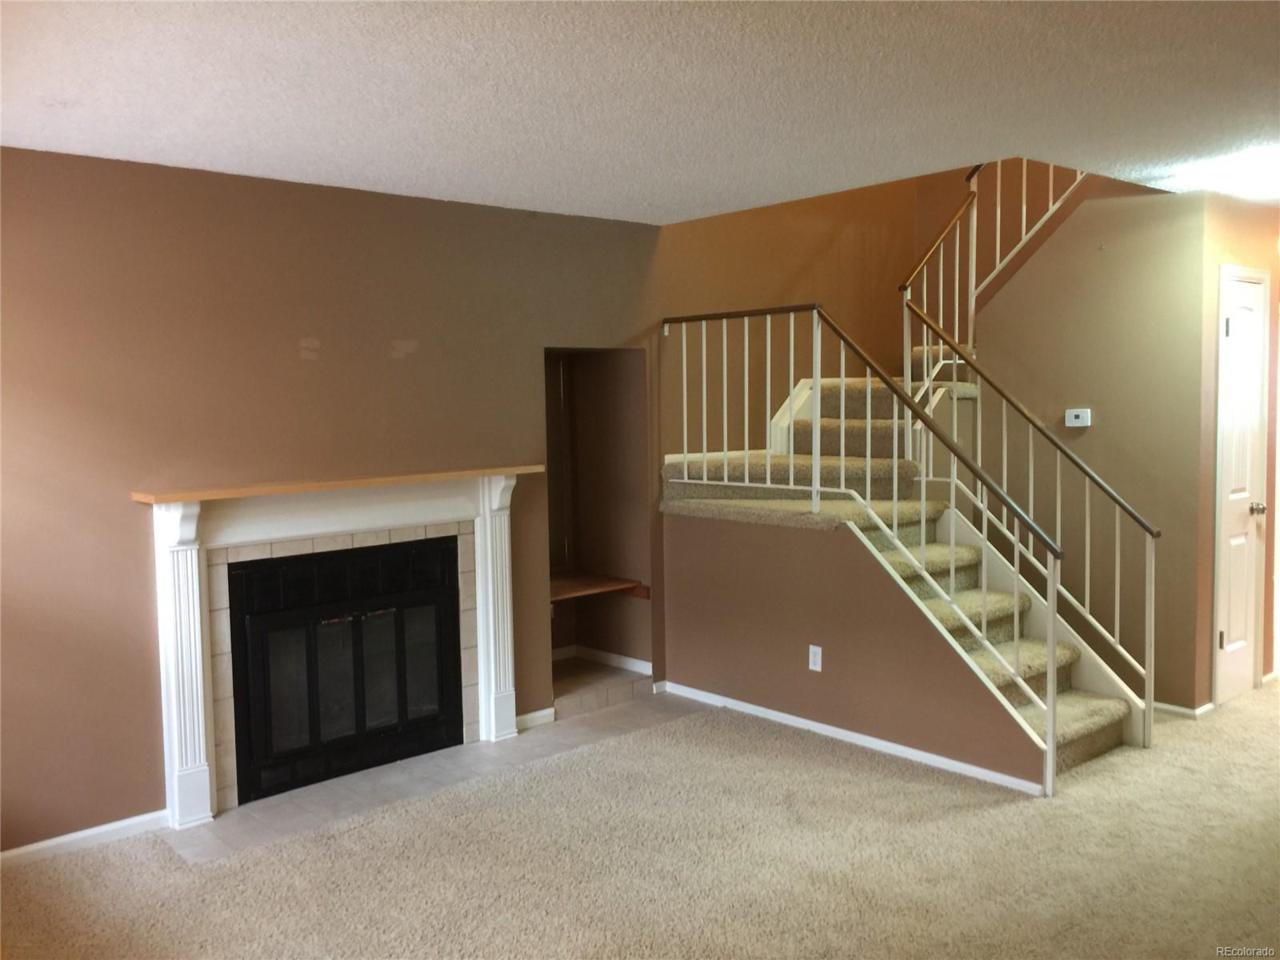 12147 Bannock Street D, Westminster, CO 80234 (MLS #4484999) :: 8z Real Estate